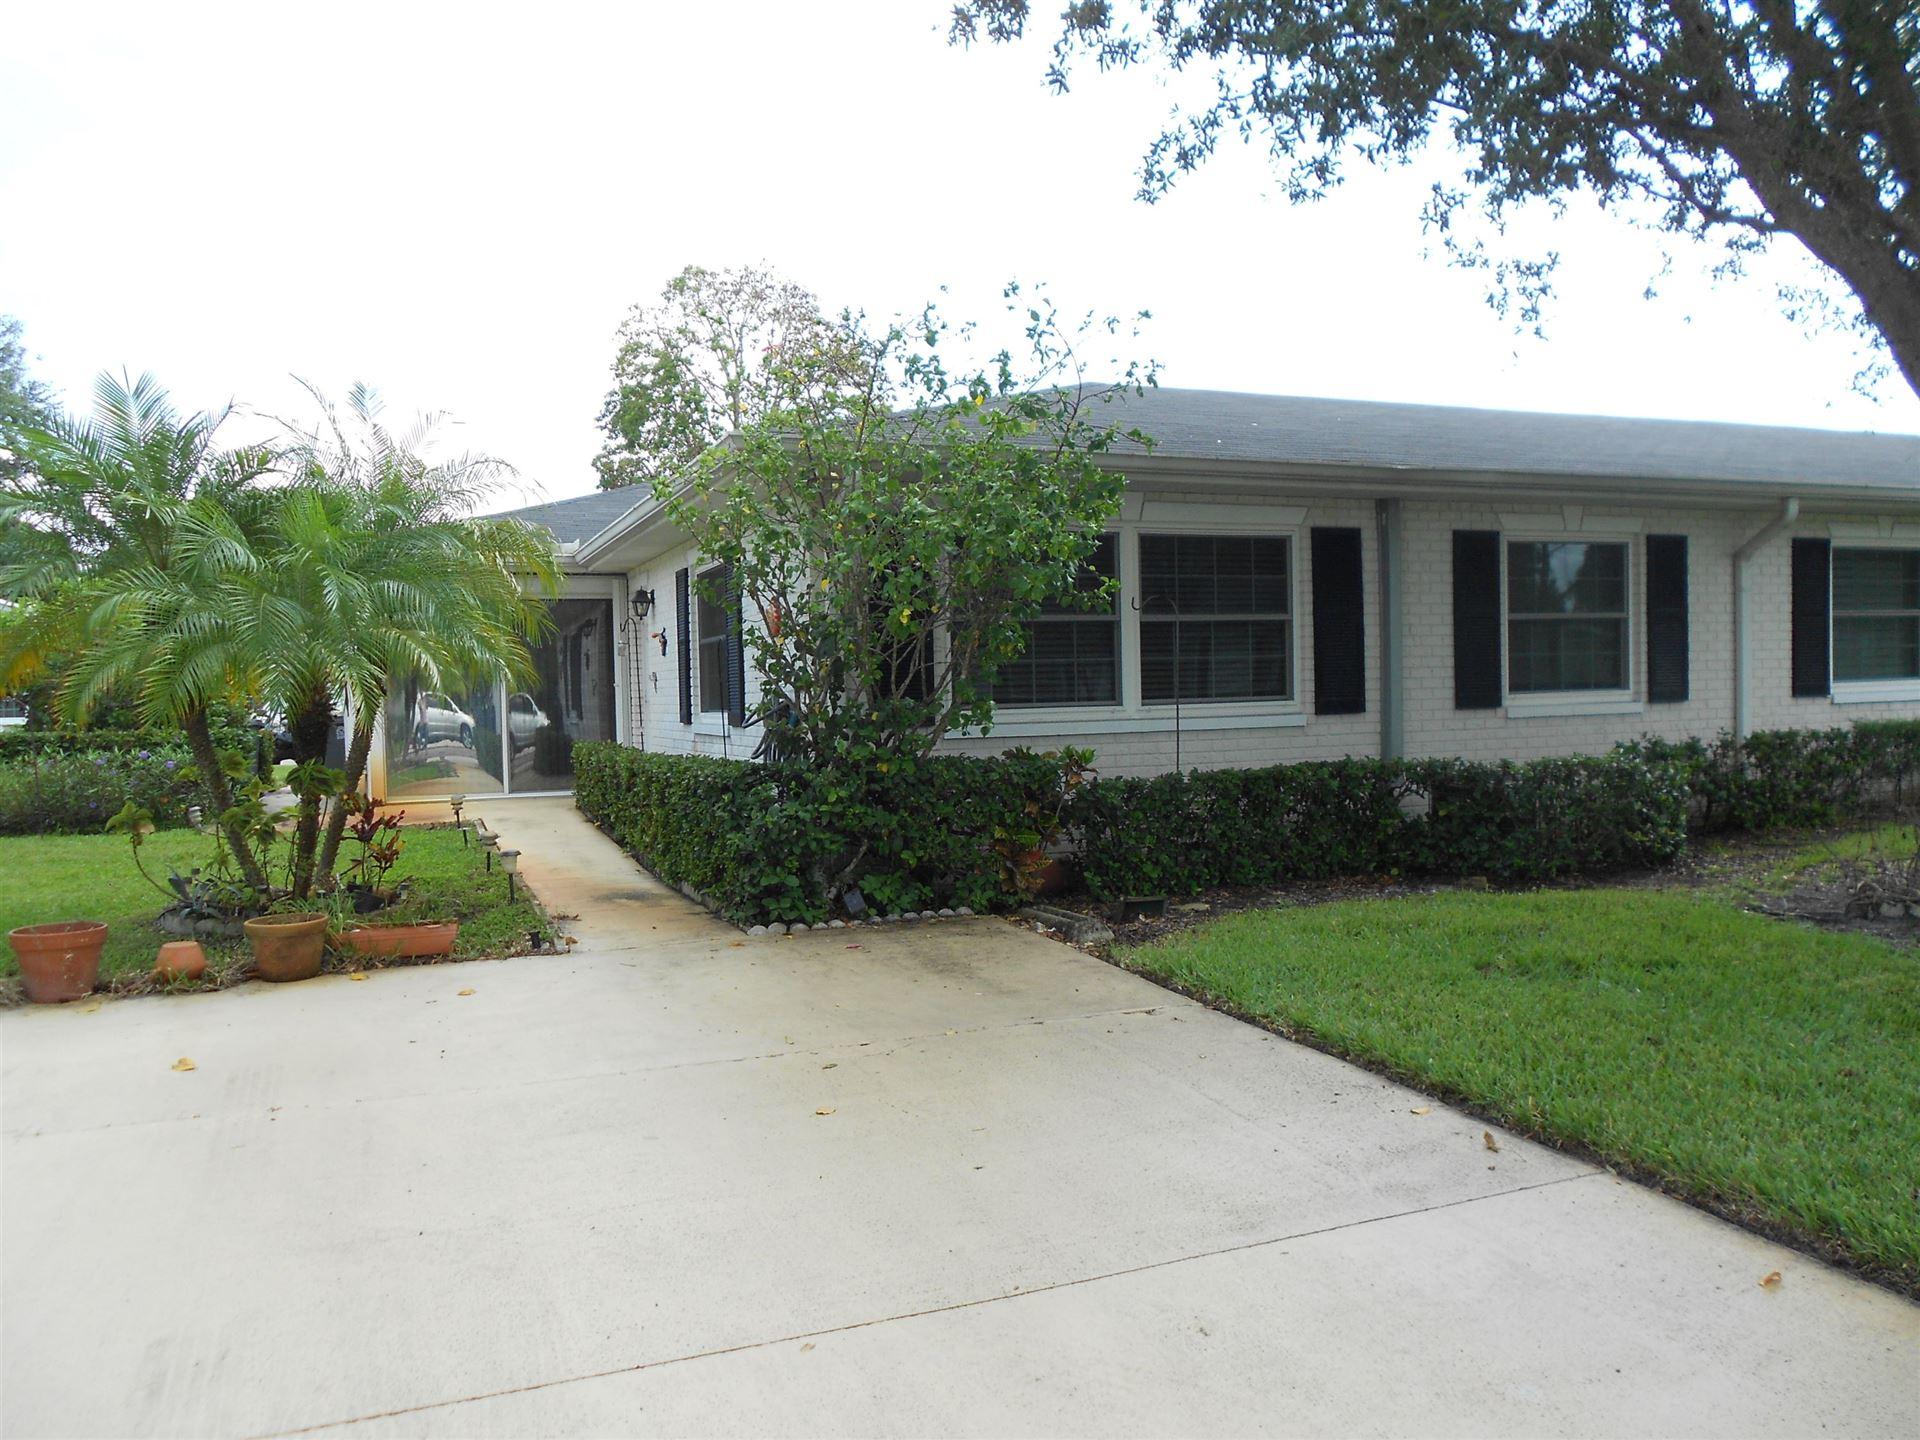 10094 45th Avenue #404, Boynton Beach, FL 33436 - #: RX-10594901